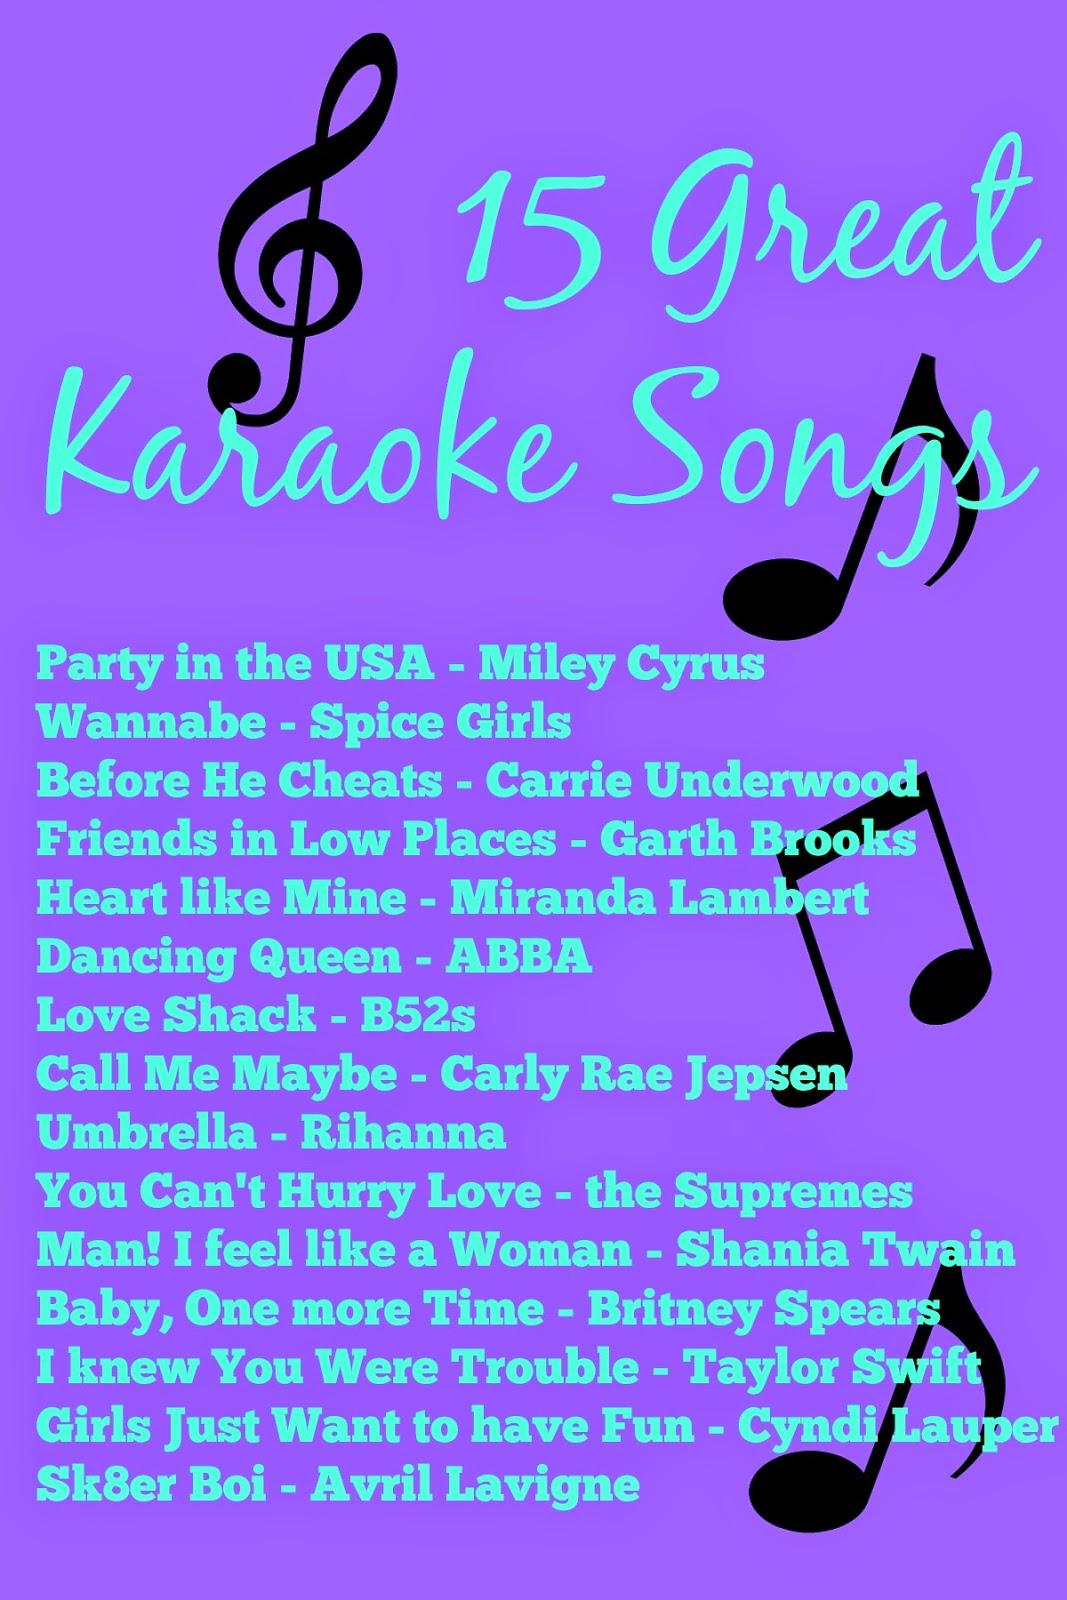 15 Great Hair Updos For Thanksgiving: Salsa : 15 Great Karaoke Songs